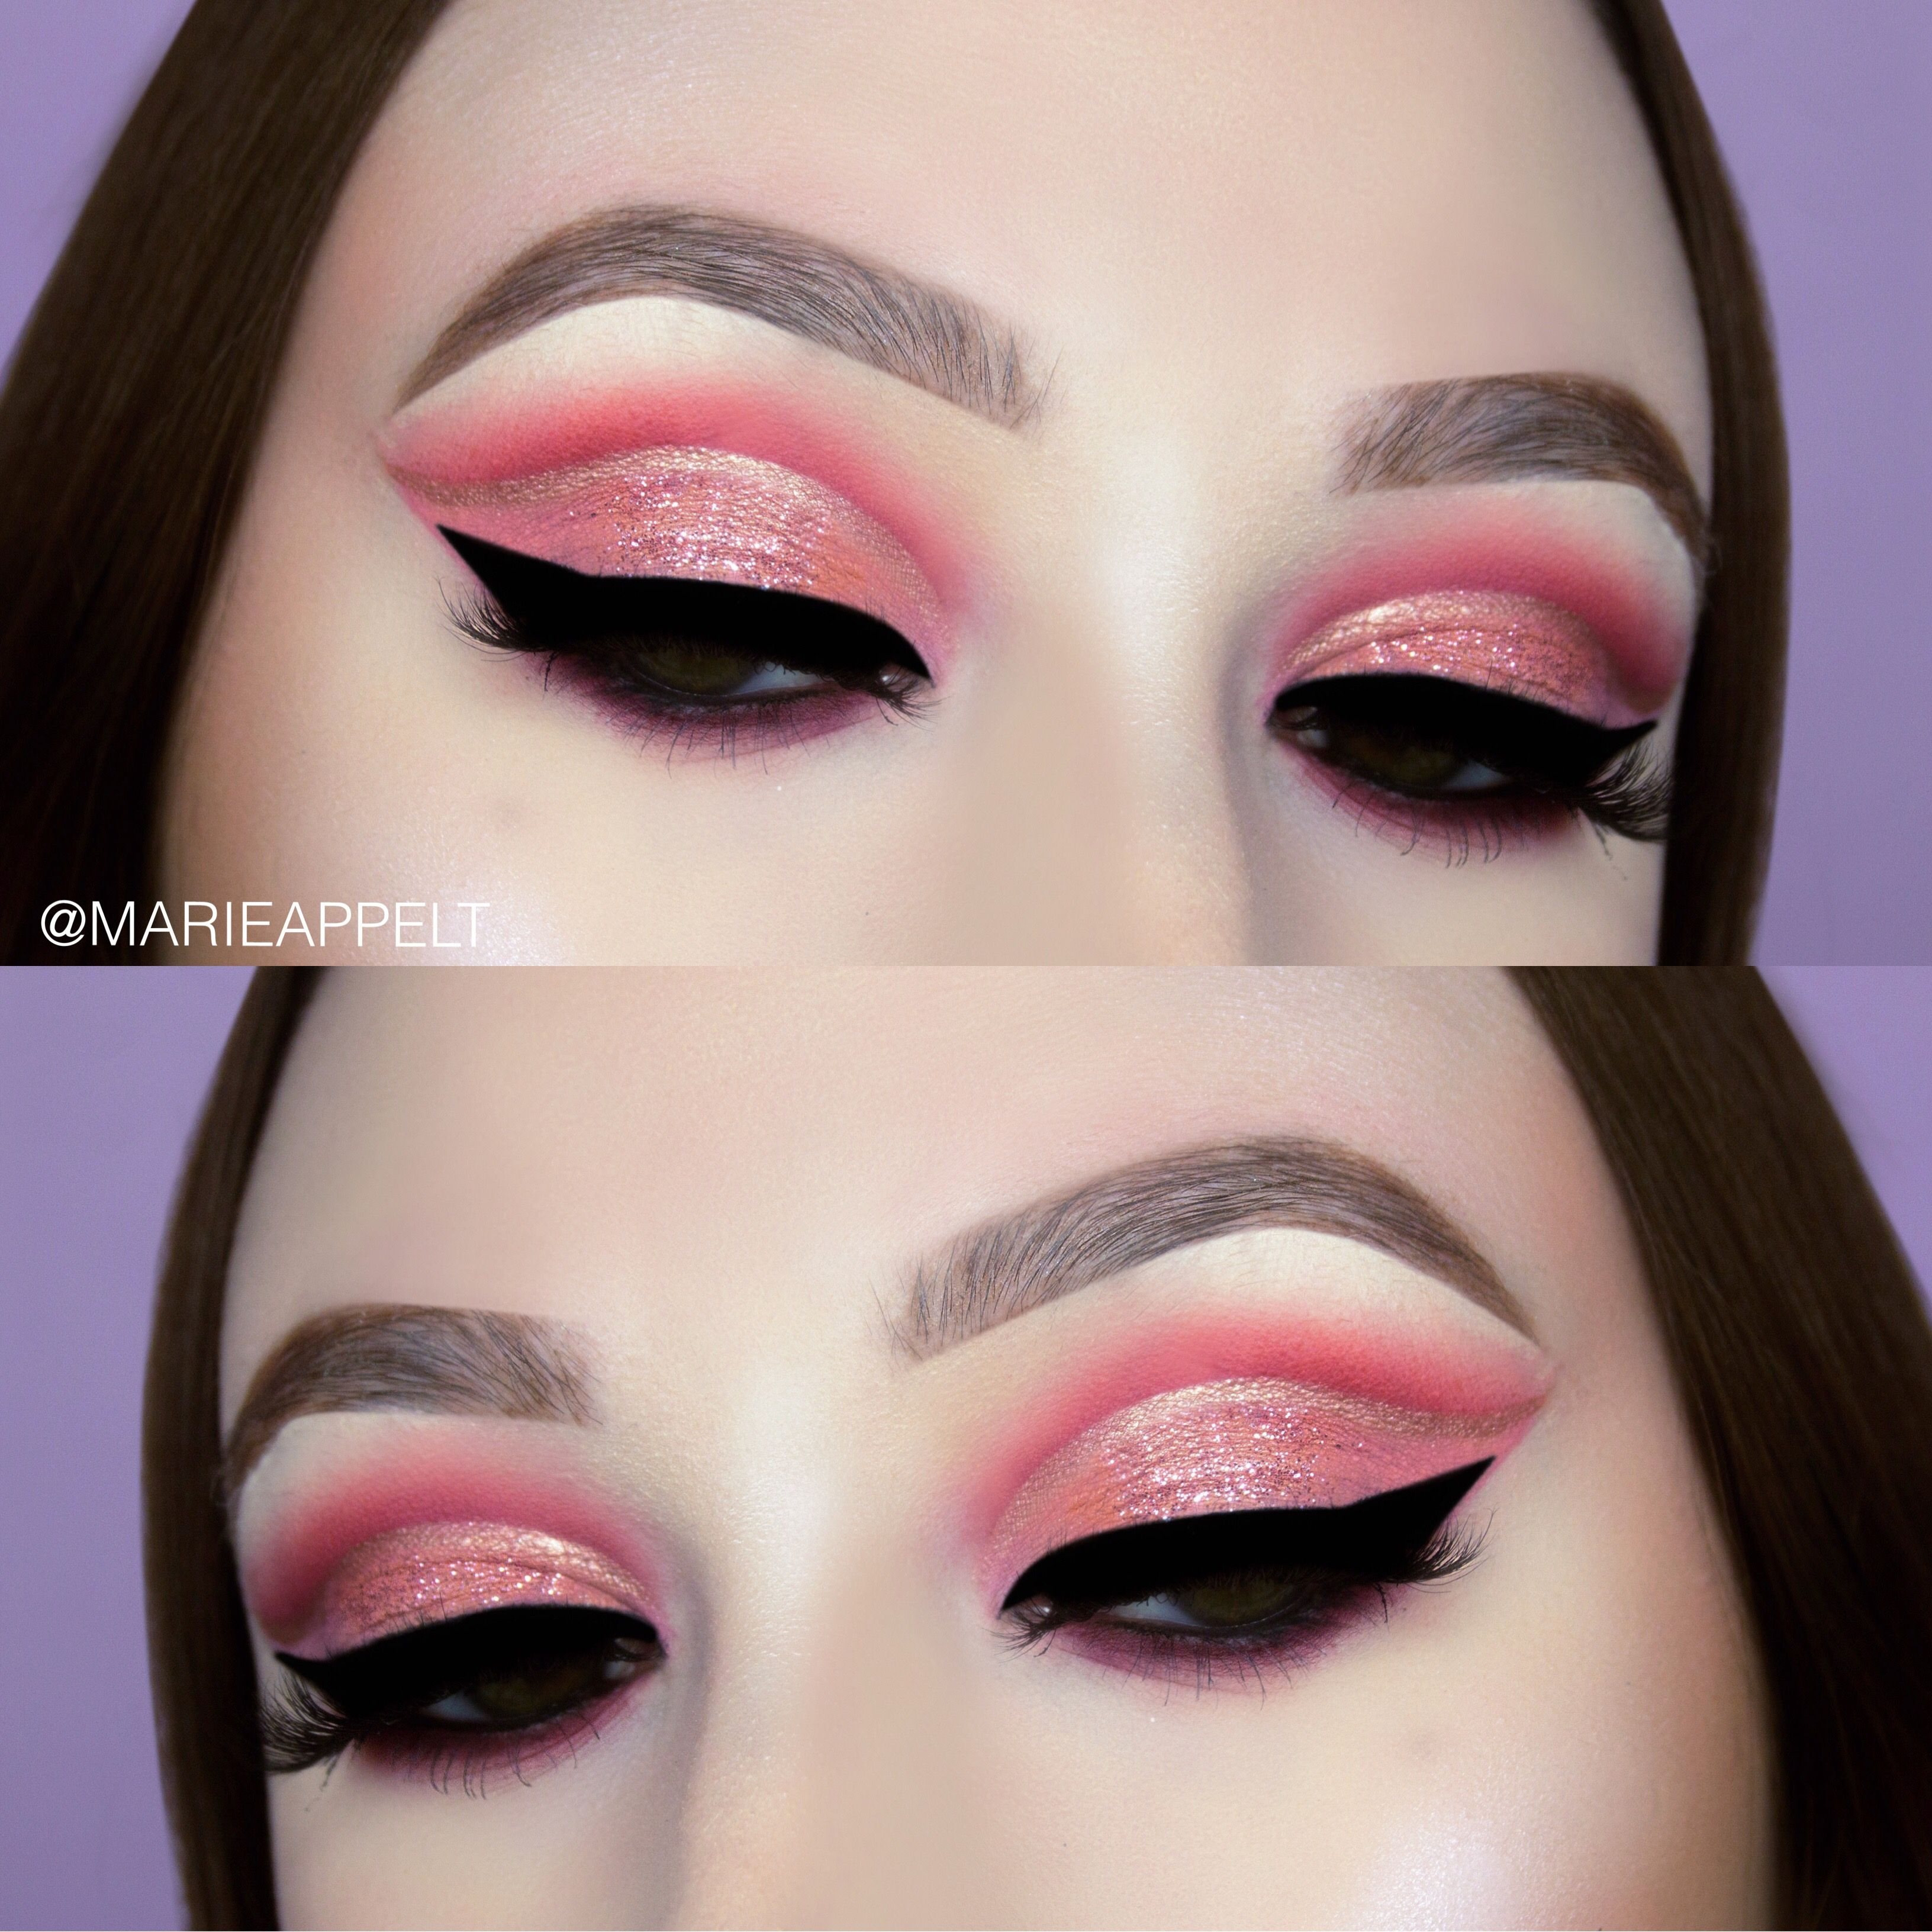 Valentines day makeup tutorial 2018 pink glitter cut crease huda valentines day makeup tutorial 2018 pink glitter cut crease huda beauty mauve obsessions palette hudabeauty baditri Gallery